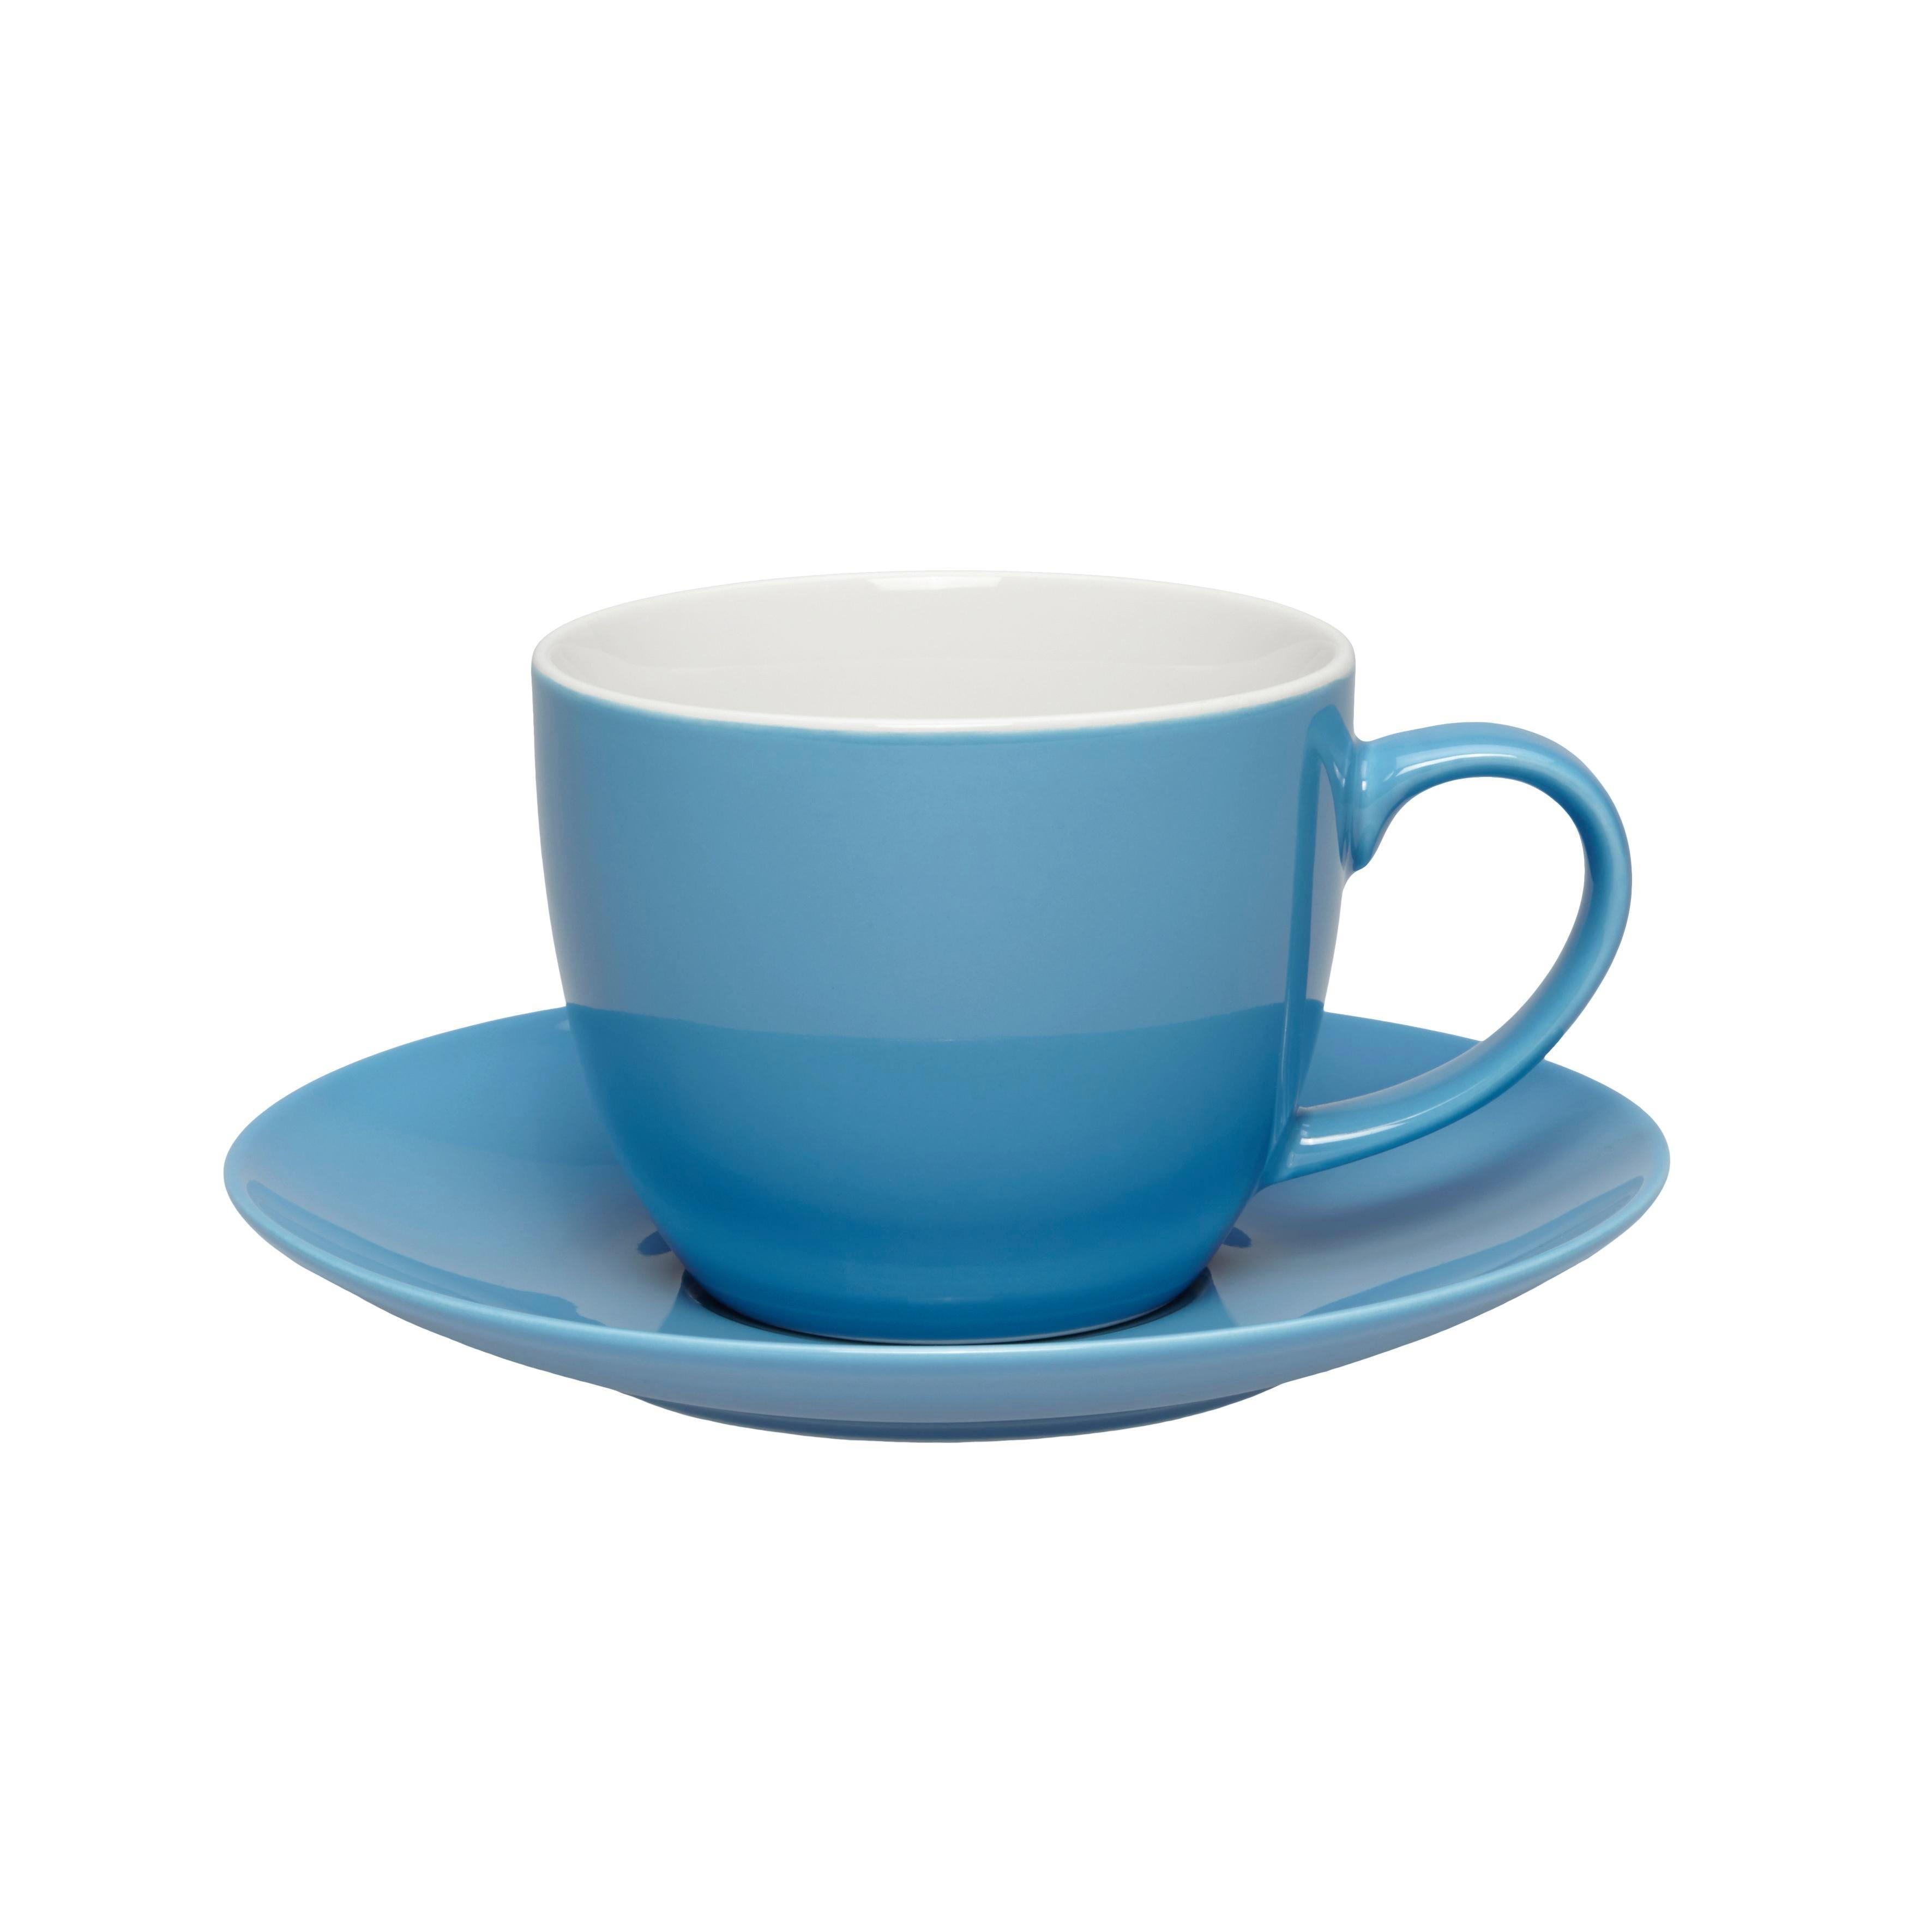 Kaffeetasse mit Untertasse Sandy in Türkis aus Keramik - Türkis, KONVENTIONELL, Keramik (5/6,9cm) - MÖMAX modern living